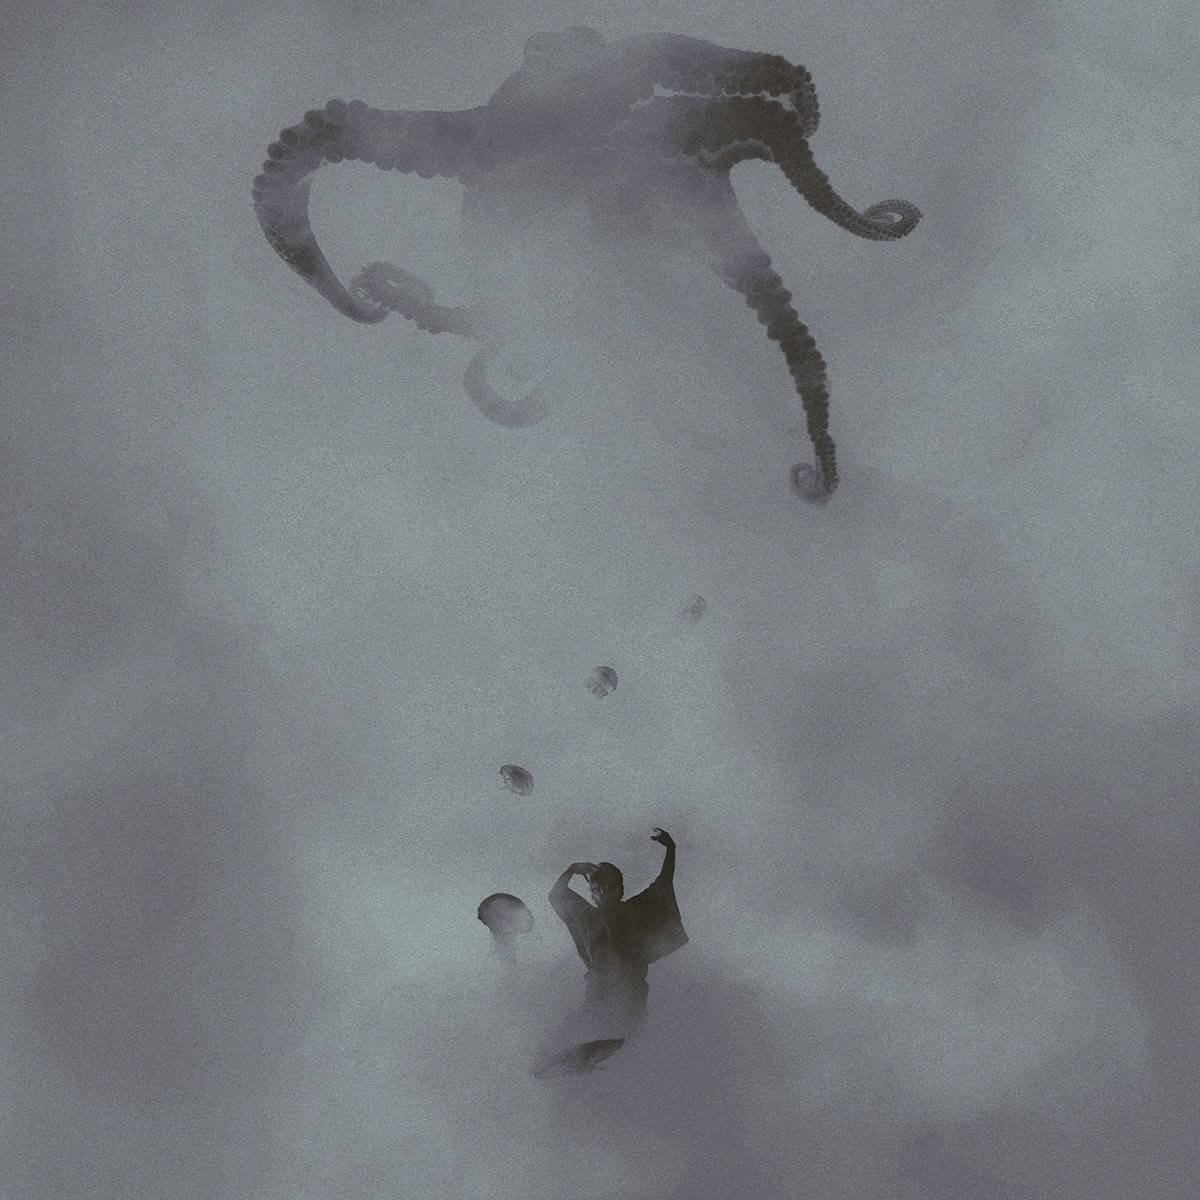 Stunning Surreal Photography Manipulation – Pulkit Kamal – Surreal Fog Octopus